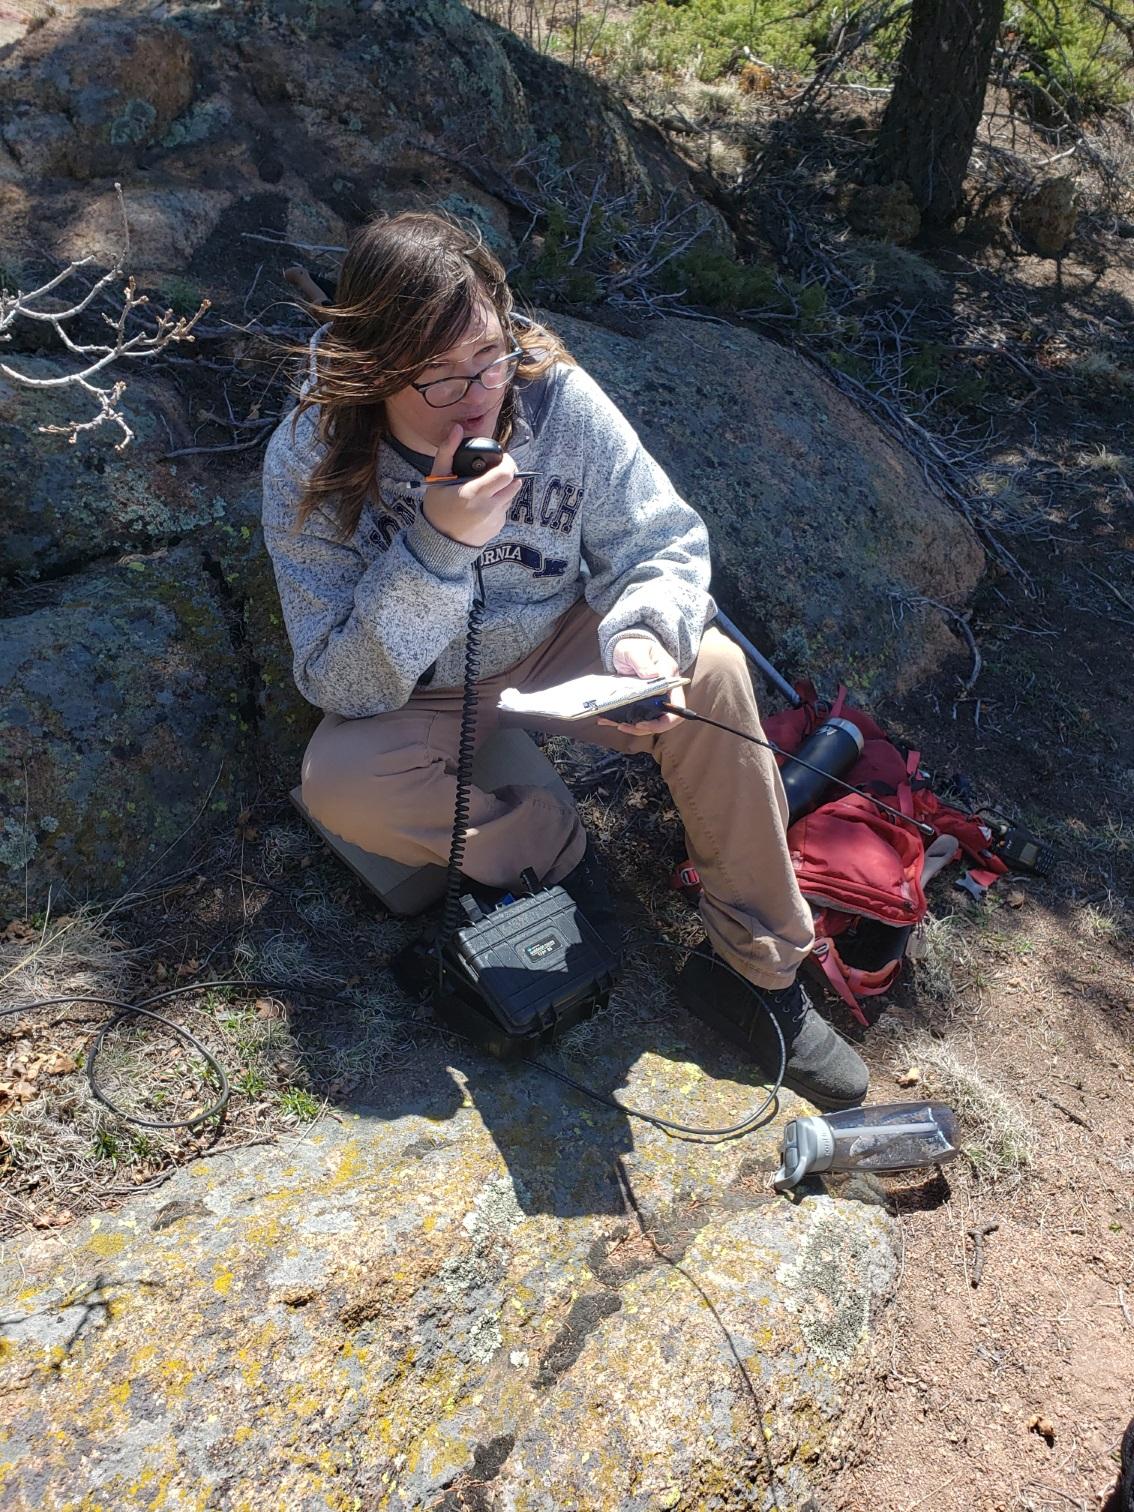 K0UOG activating Mount Herman (W0C/FR-063)